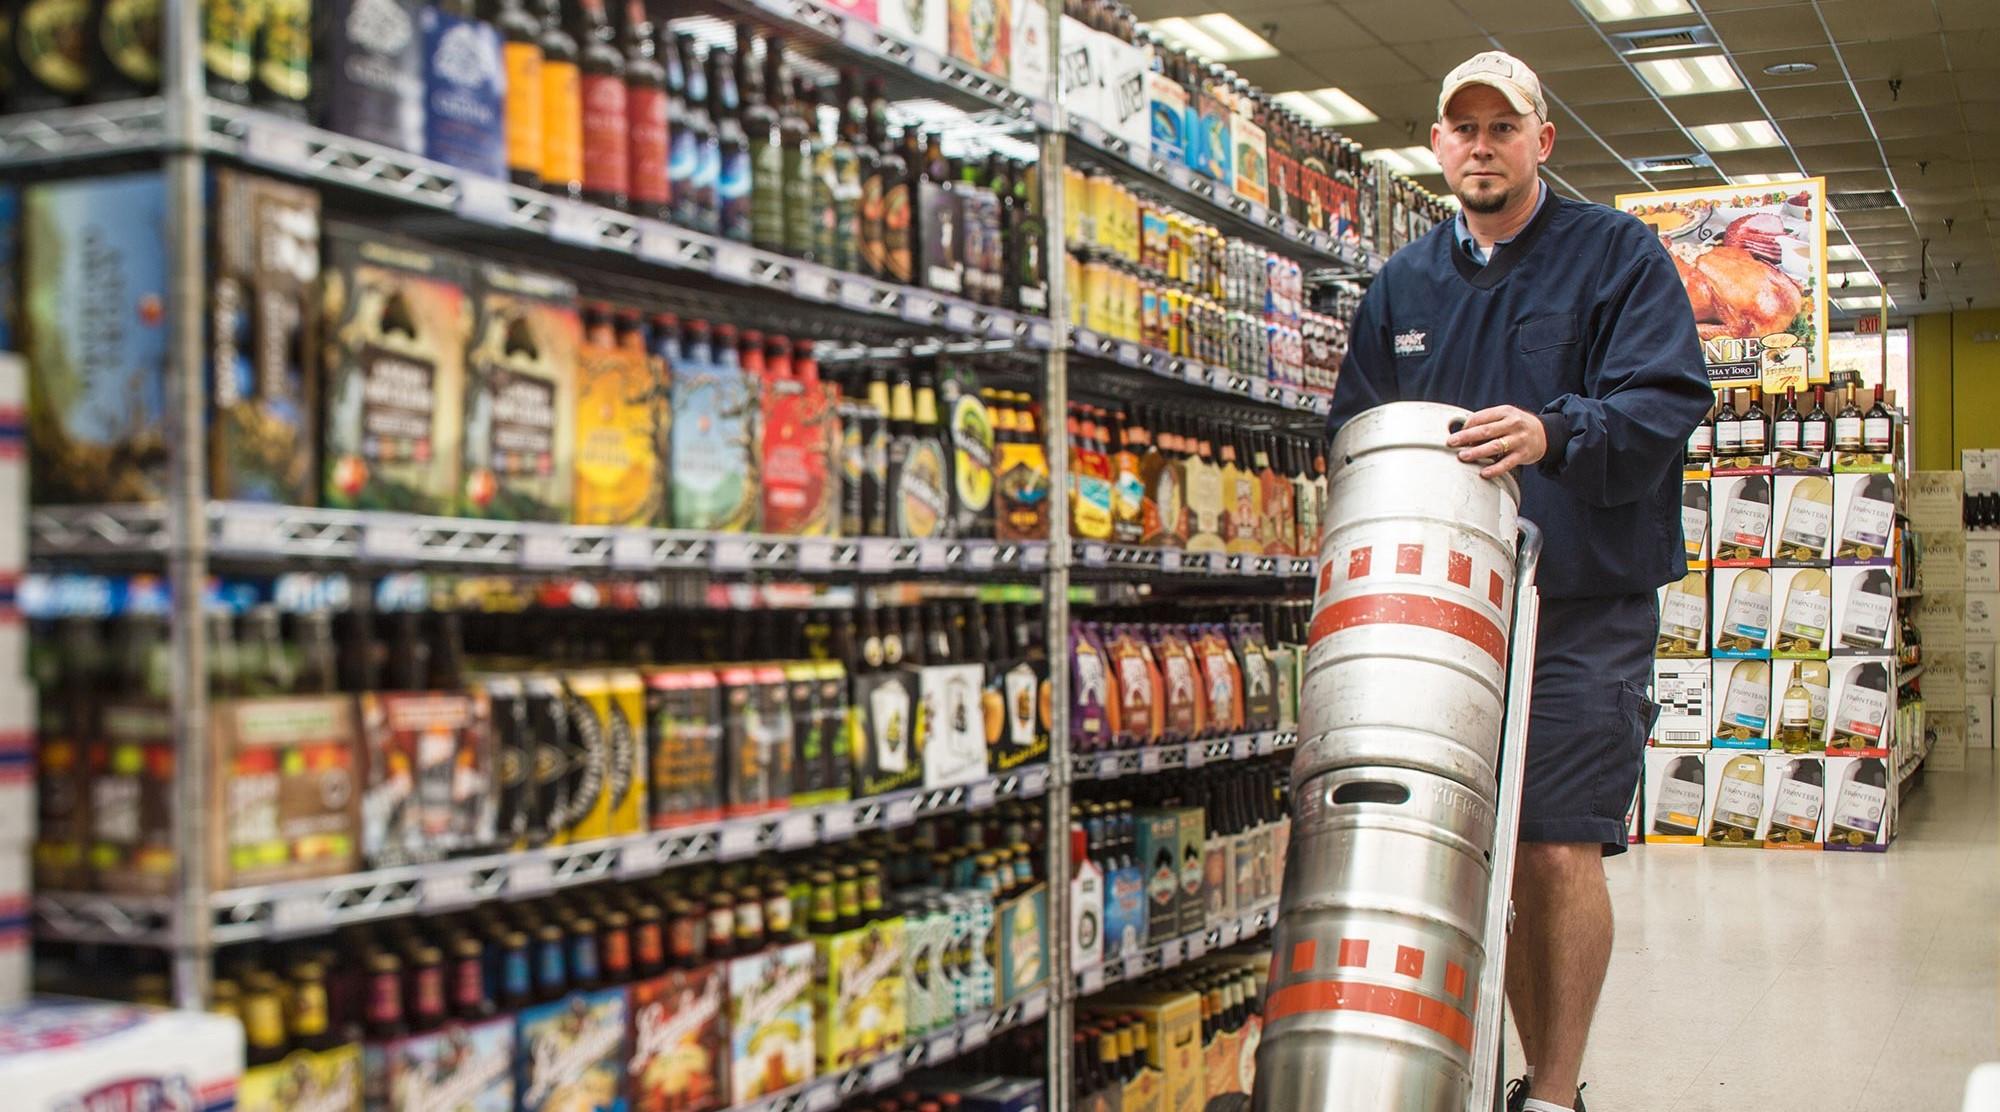 Source:   National Beer Wholesales Assoc